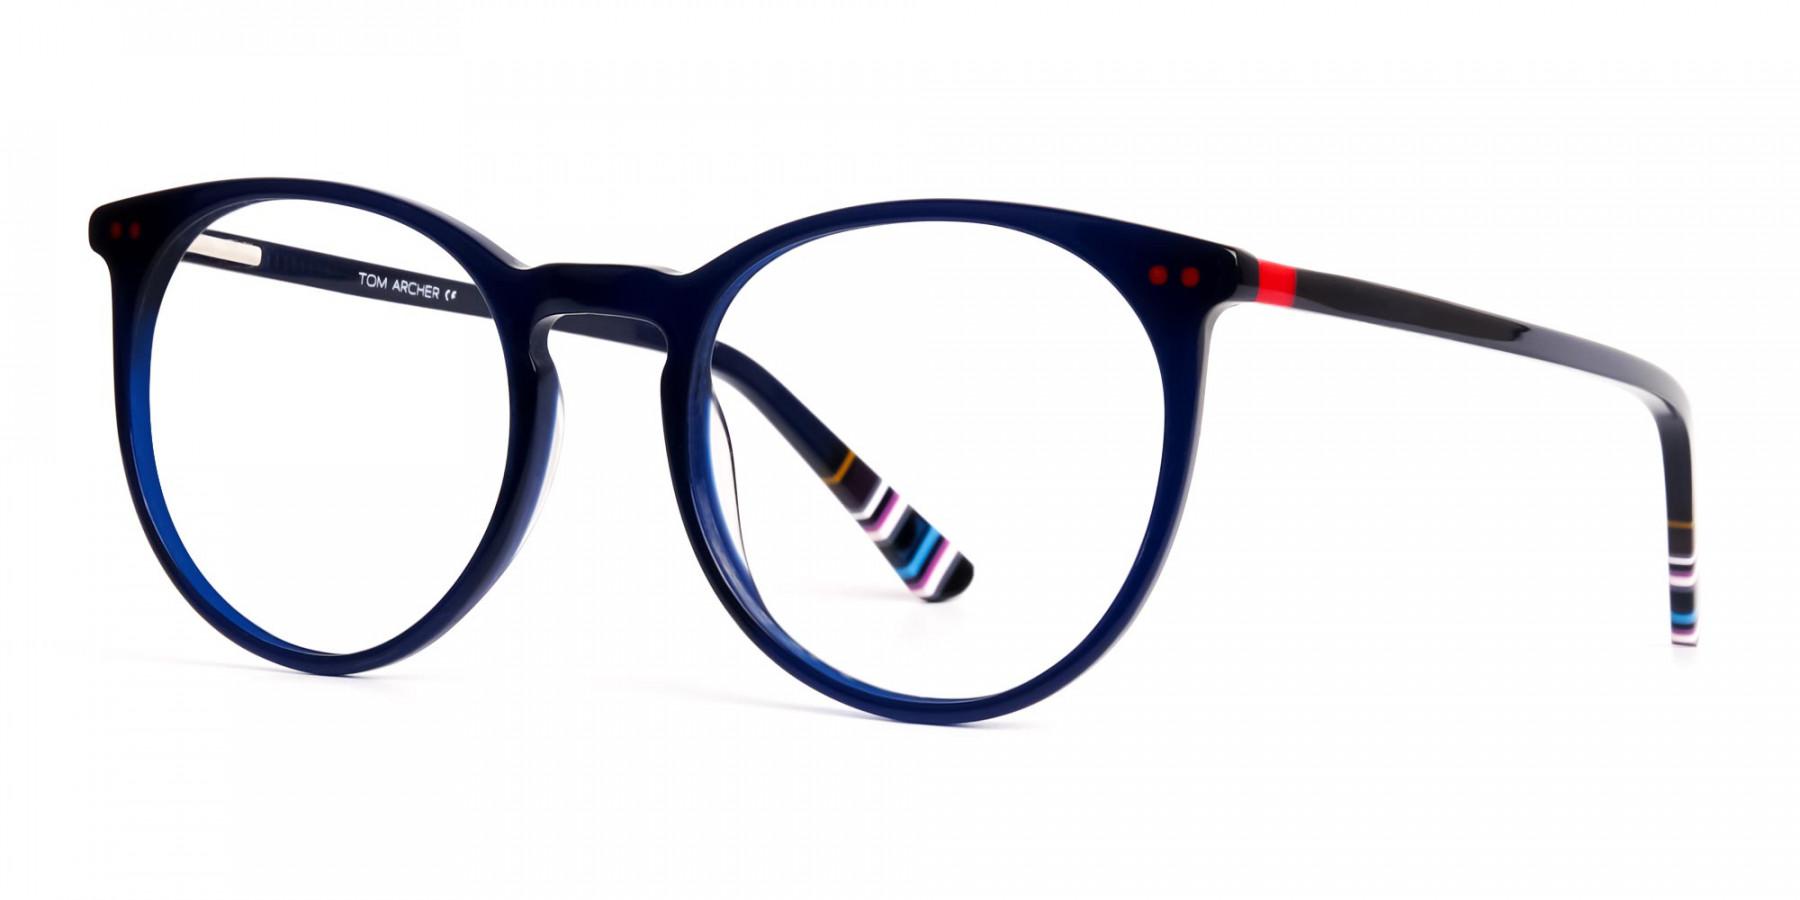 Bright-Indigo-Blue-Designer-Round-Glasses-frames-1